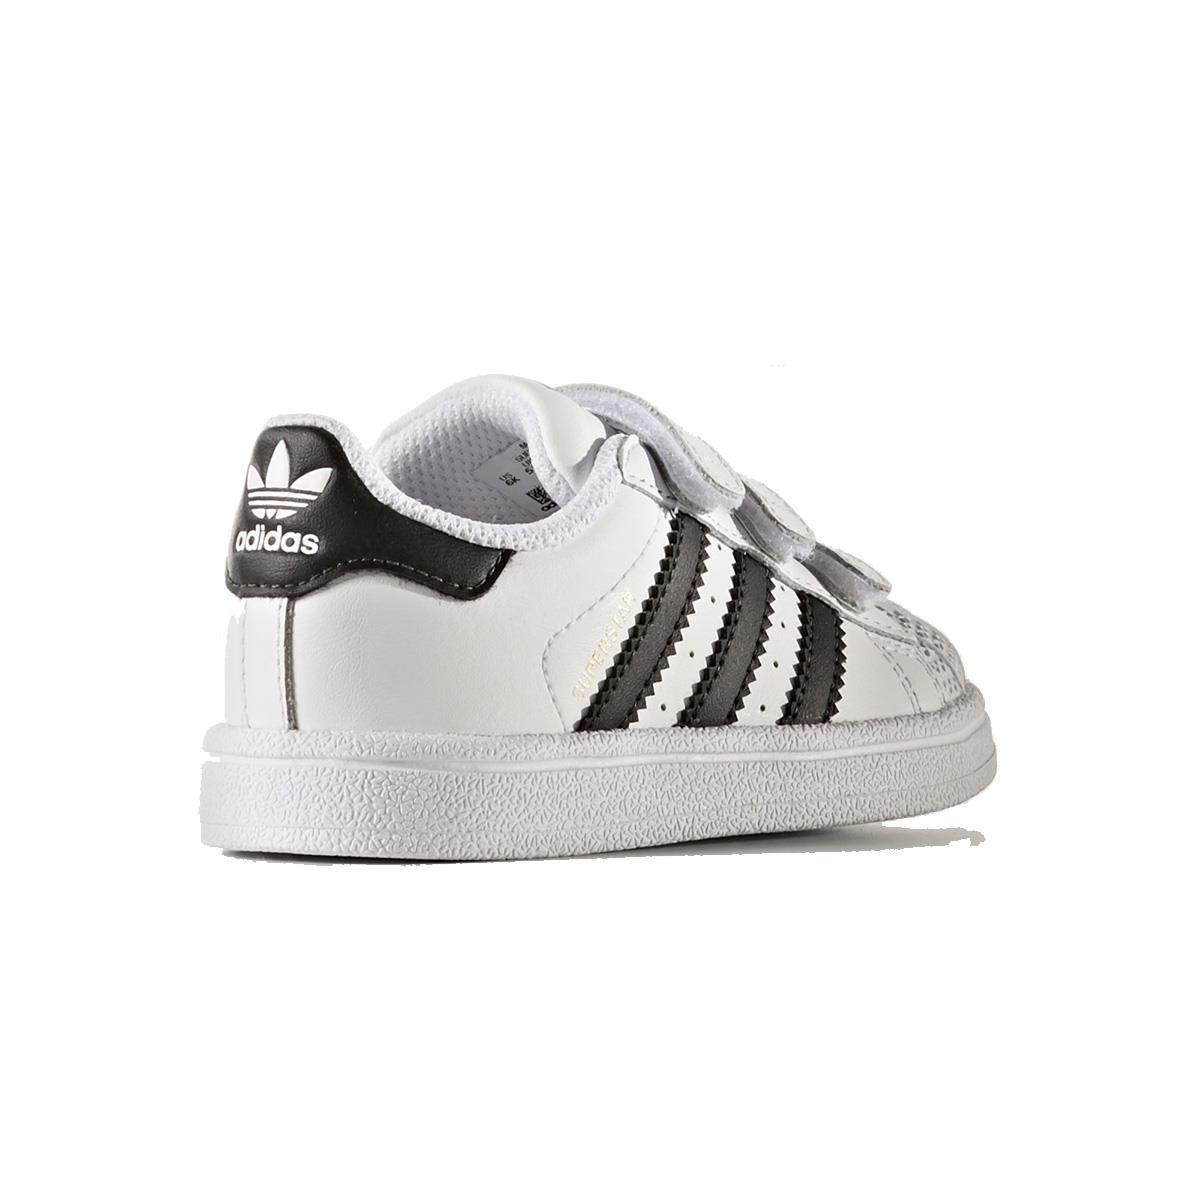 5db8ad340 Tênis Adidas Superstar CF I Infantil